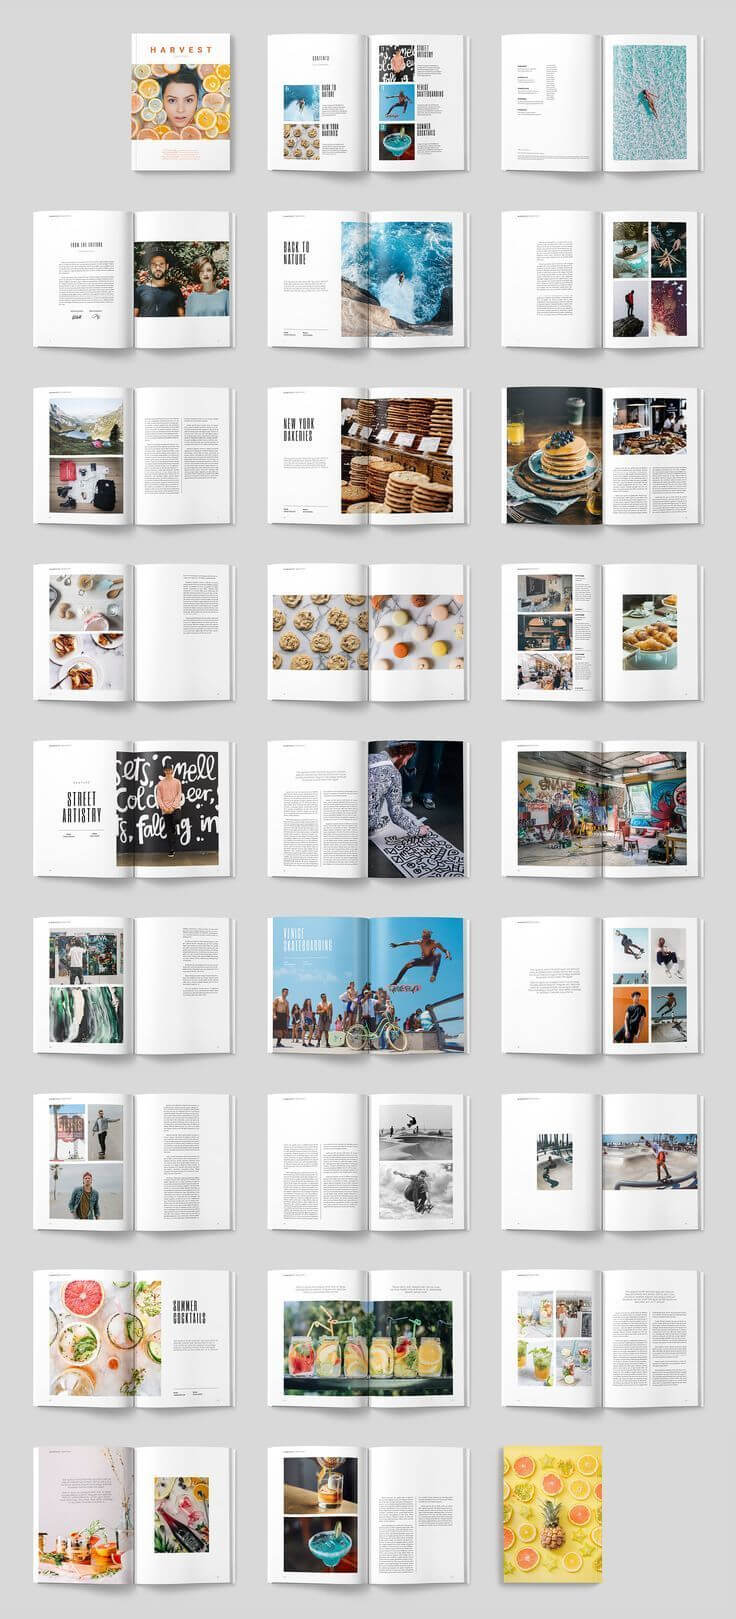 040 Magazine Template For Microsoft Word Ideas Wondrous Within Magazine Template For Microsoft Word